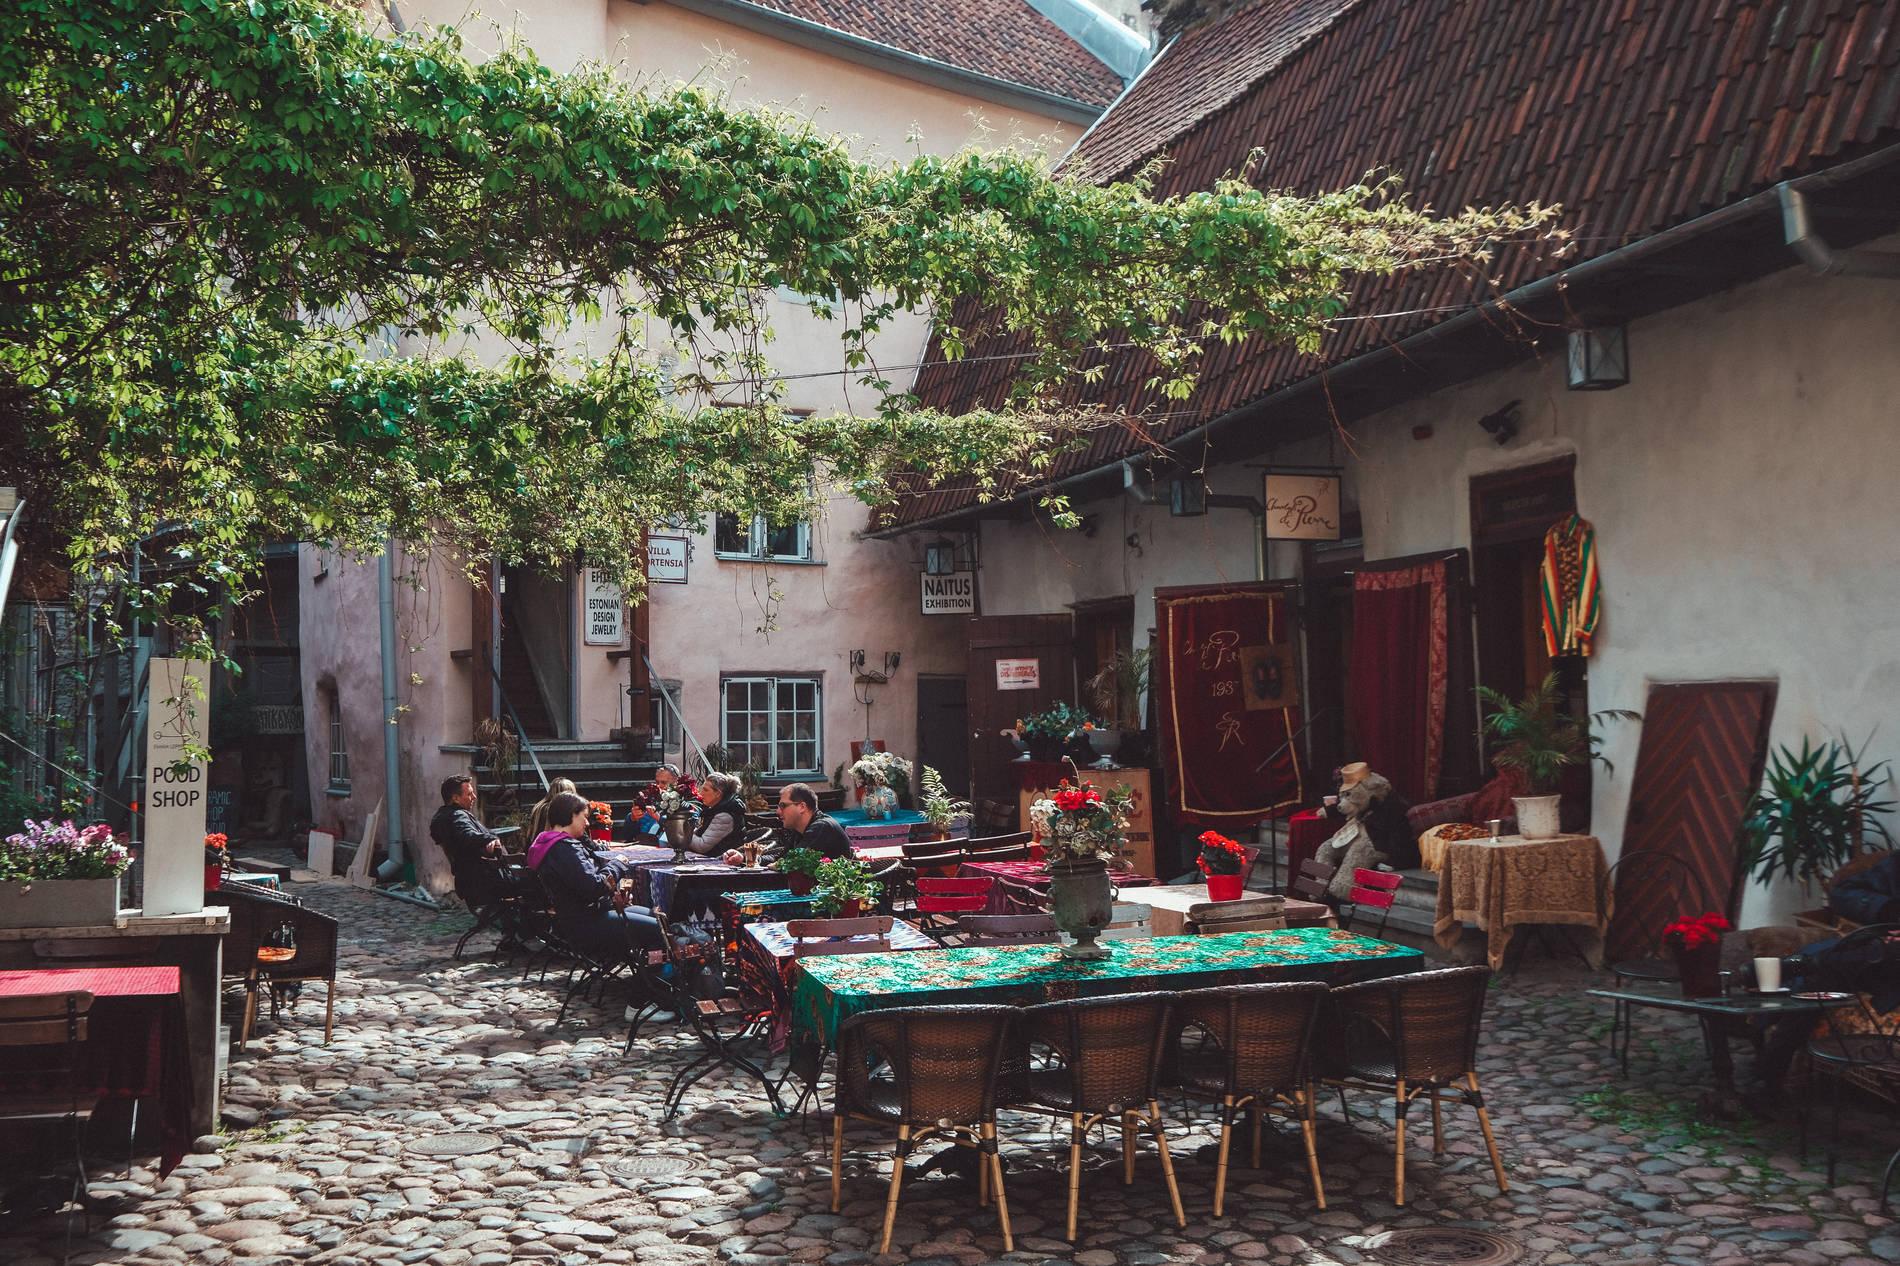 View of the Masters Courtyard in the Old Town of Tallinn, Estonia. Photo by: Kadi-Liis Koppel